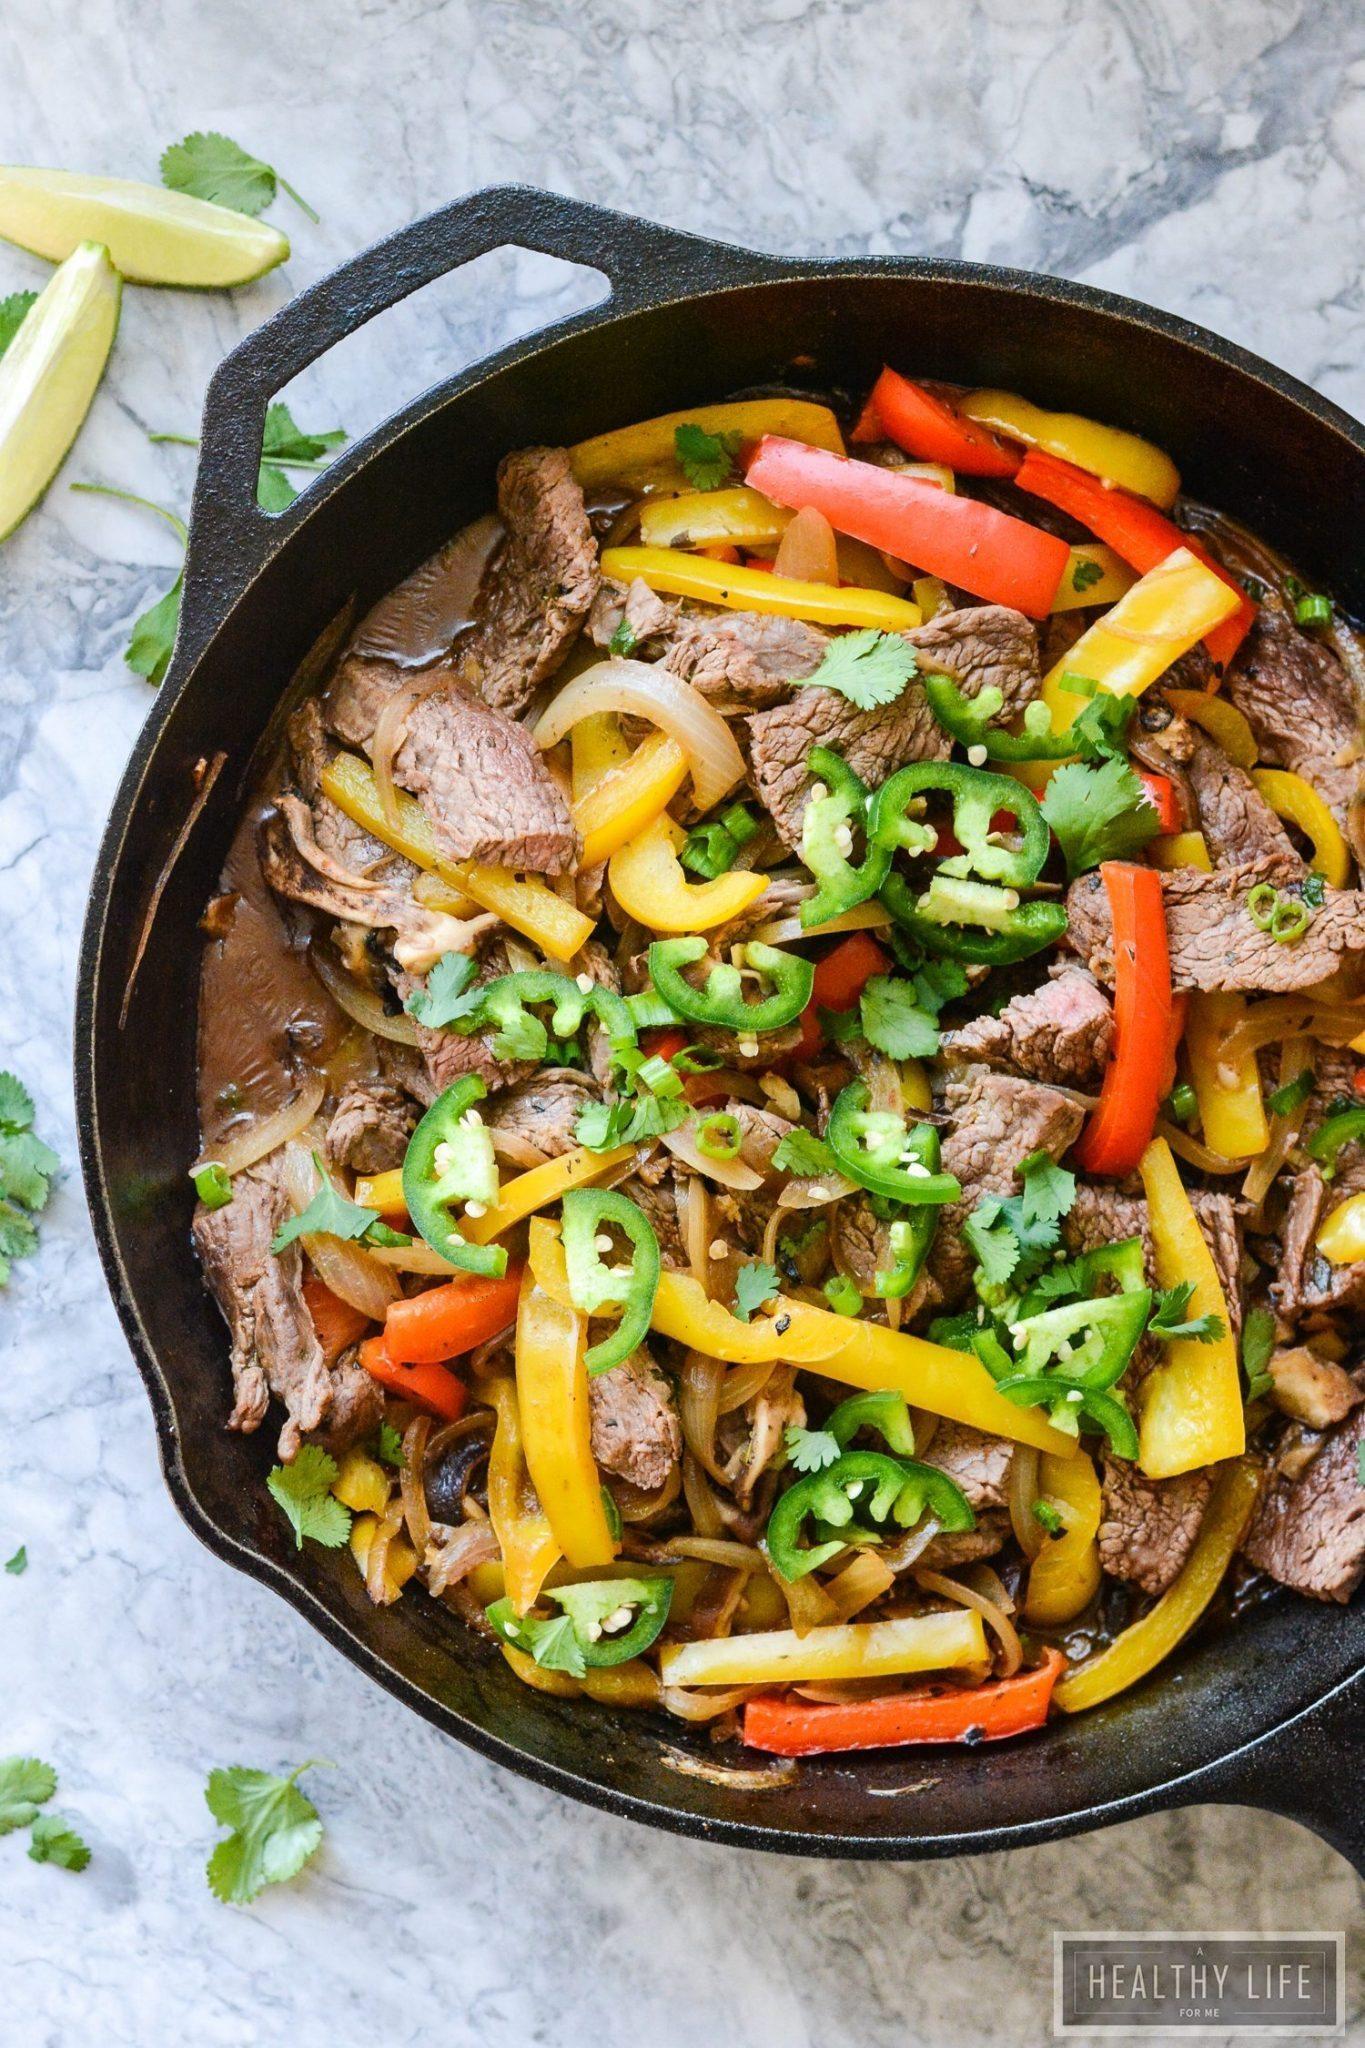 Asparagus Recipes Sauteed Meals